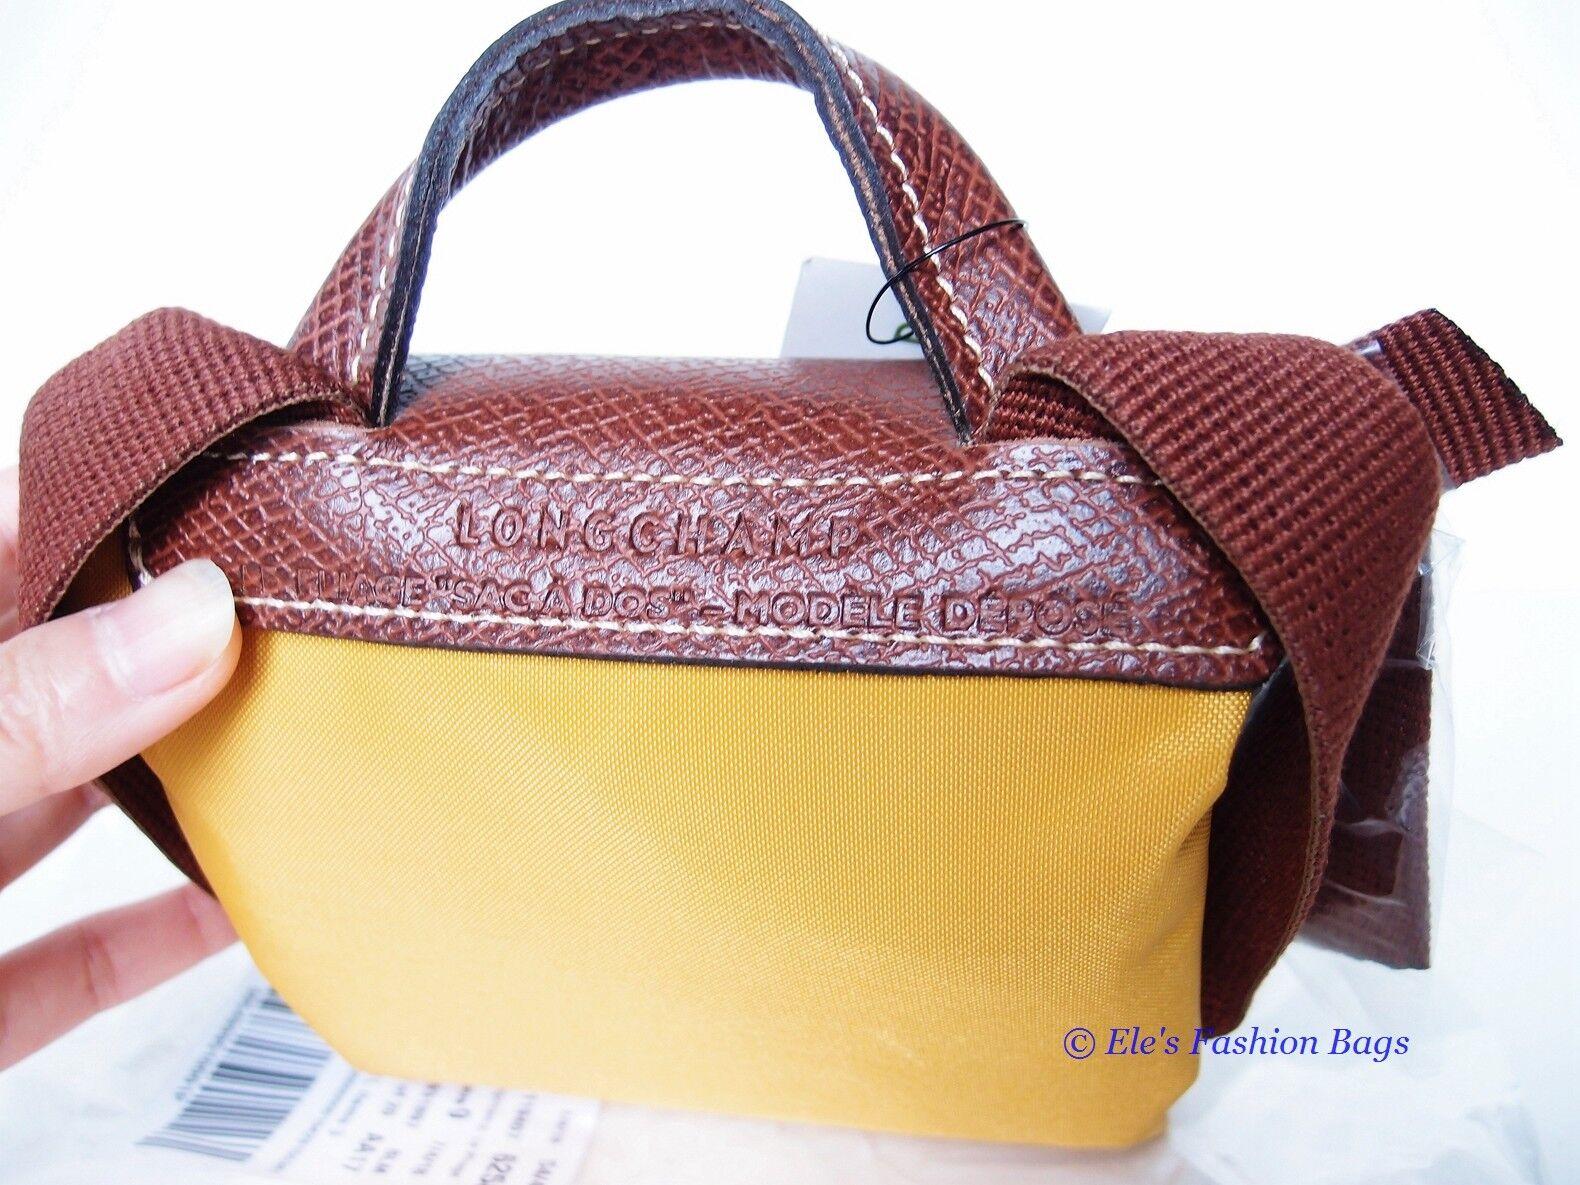 ccdabc4dee Longchamp Le Pliage Nylon Backpack 1699089620 Sunshine Yellow Auth for sale  online | eBay